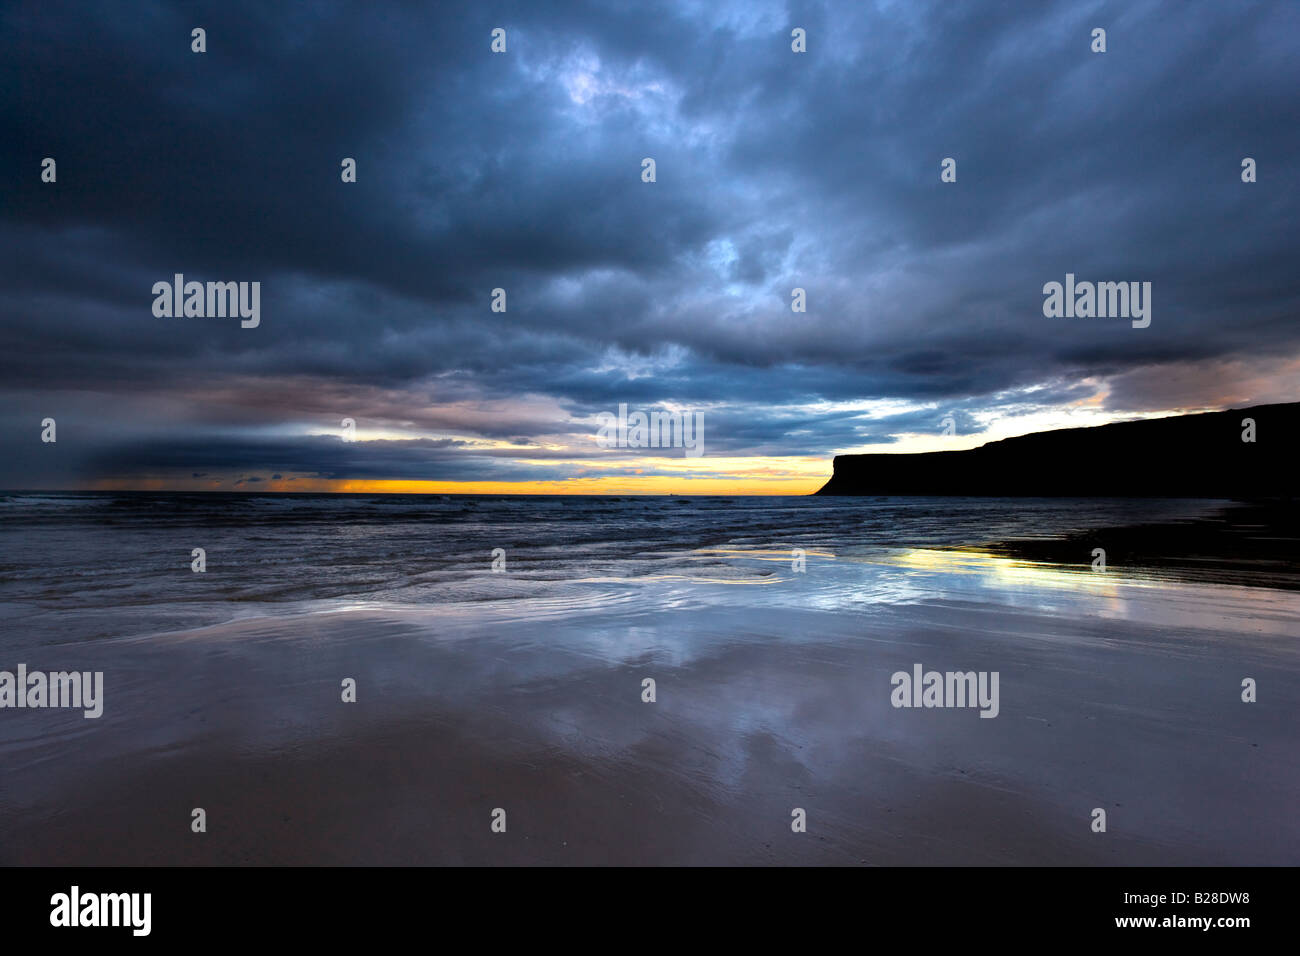 Stormy sky at low tide Huntcliff Saltburn Cleveland - Stock Image